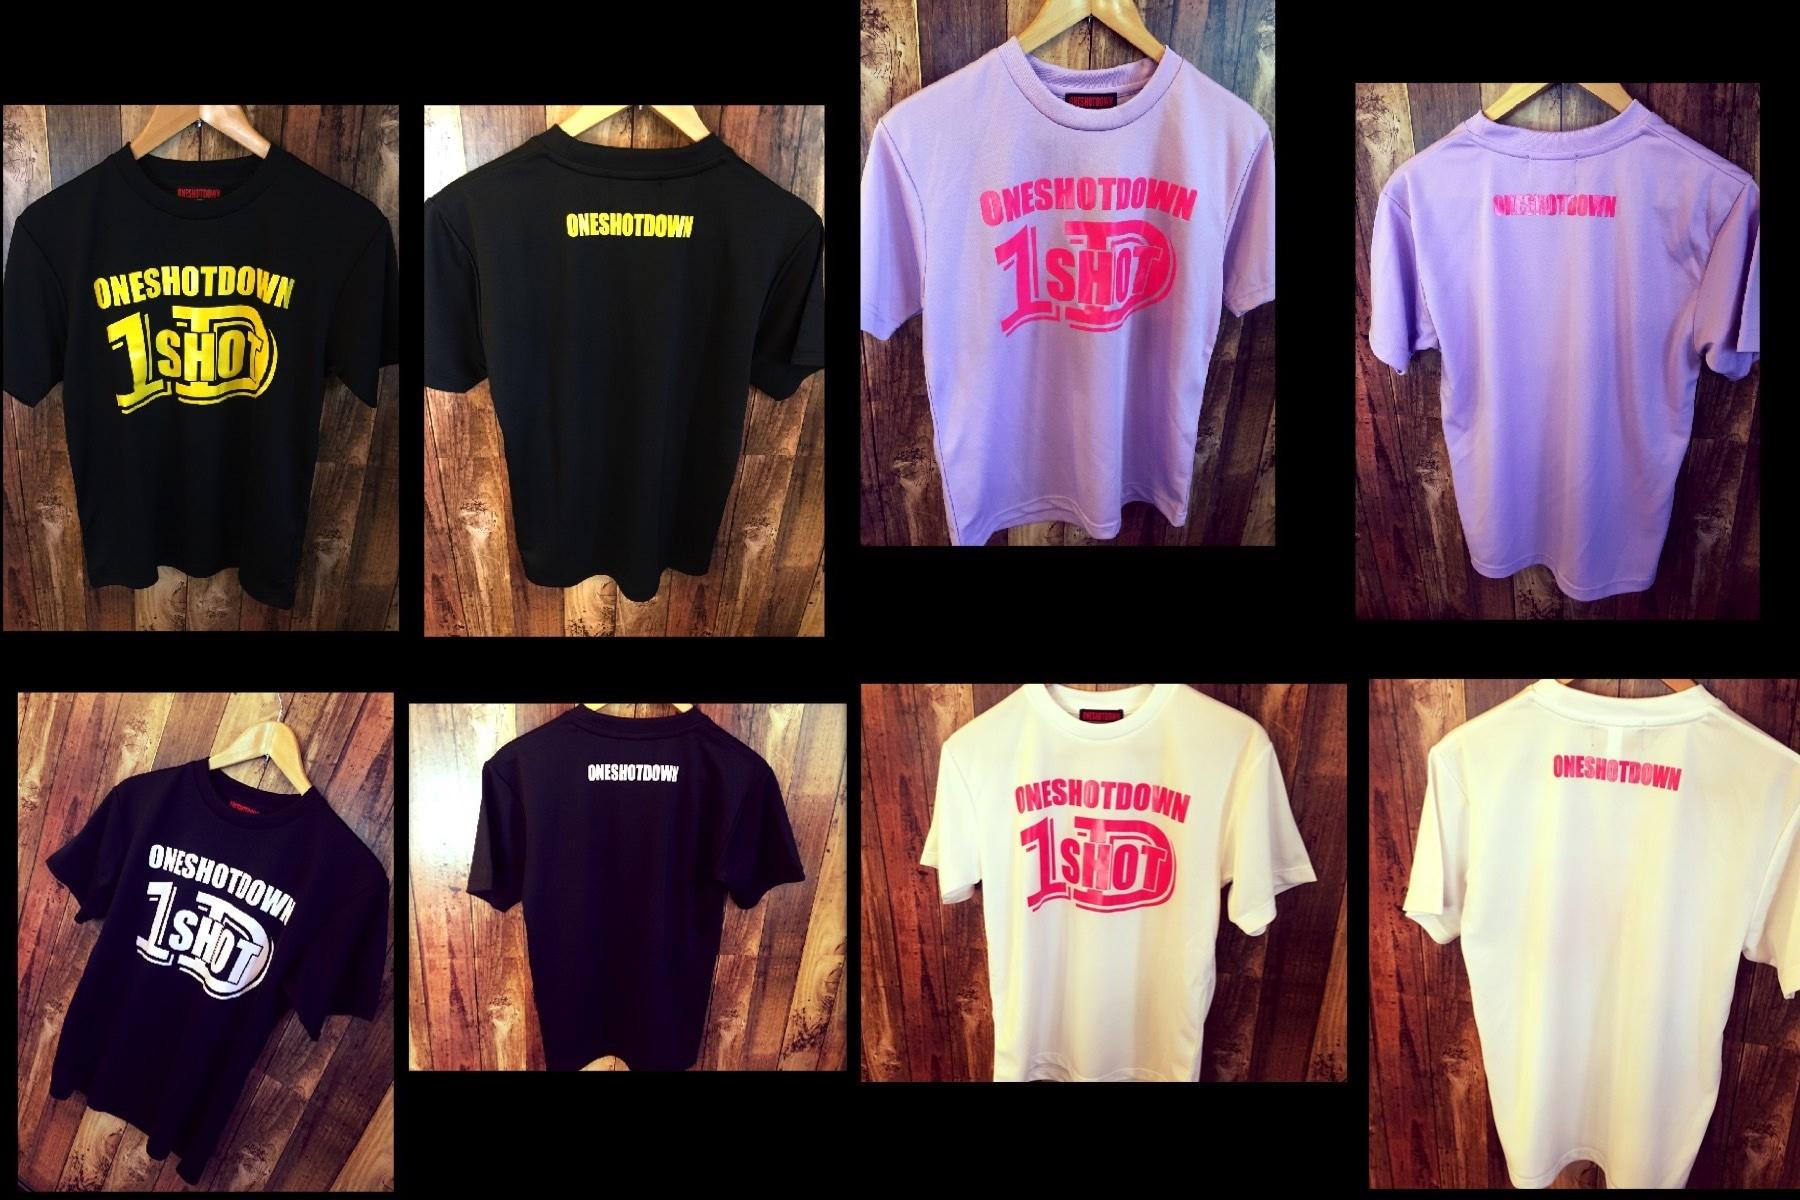 ONESHOTDOWN ロゴ ドライTシャツ - 画像3